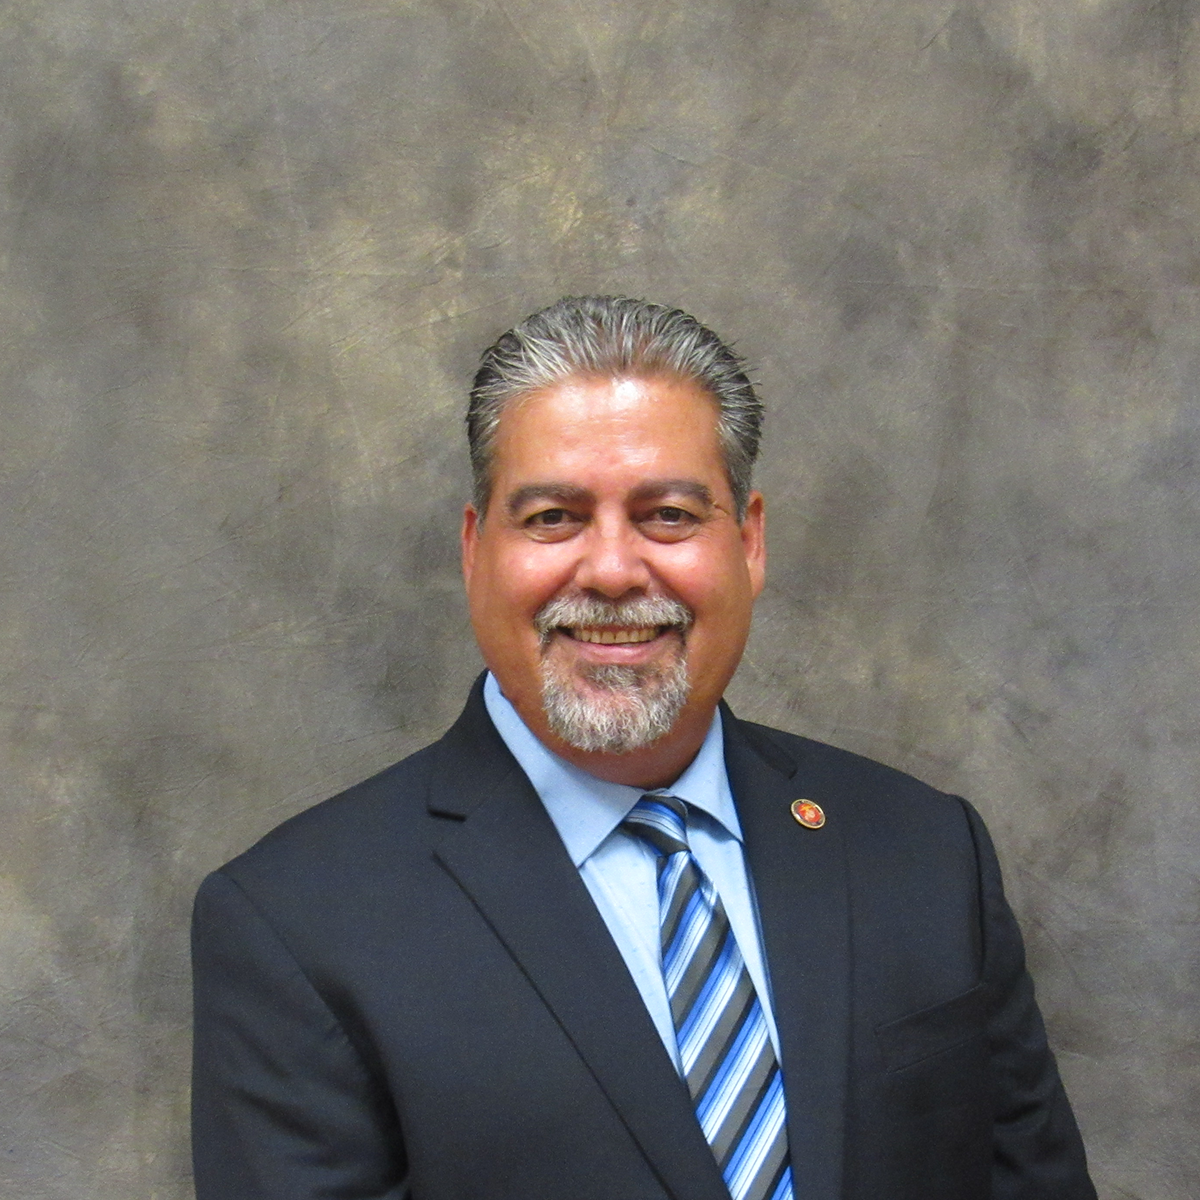 Andrew R. Rodriguez, Executive Director